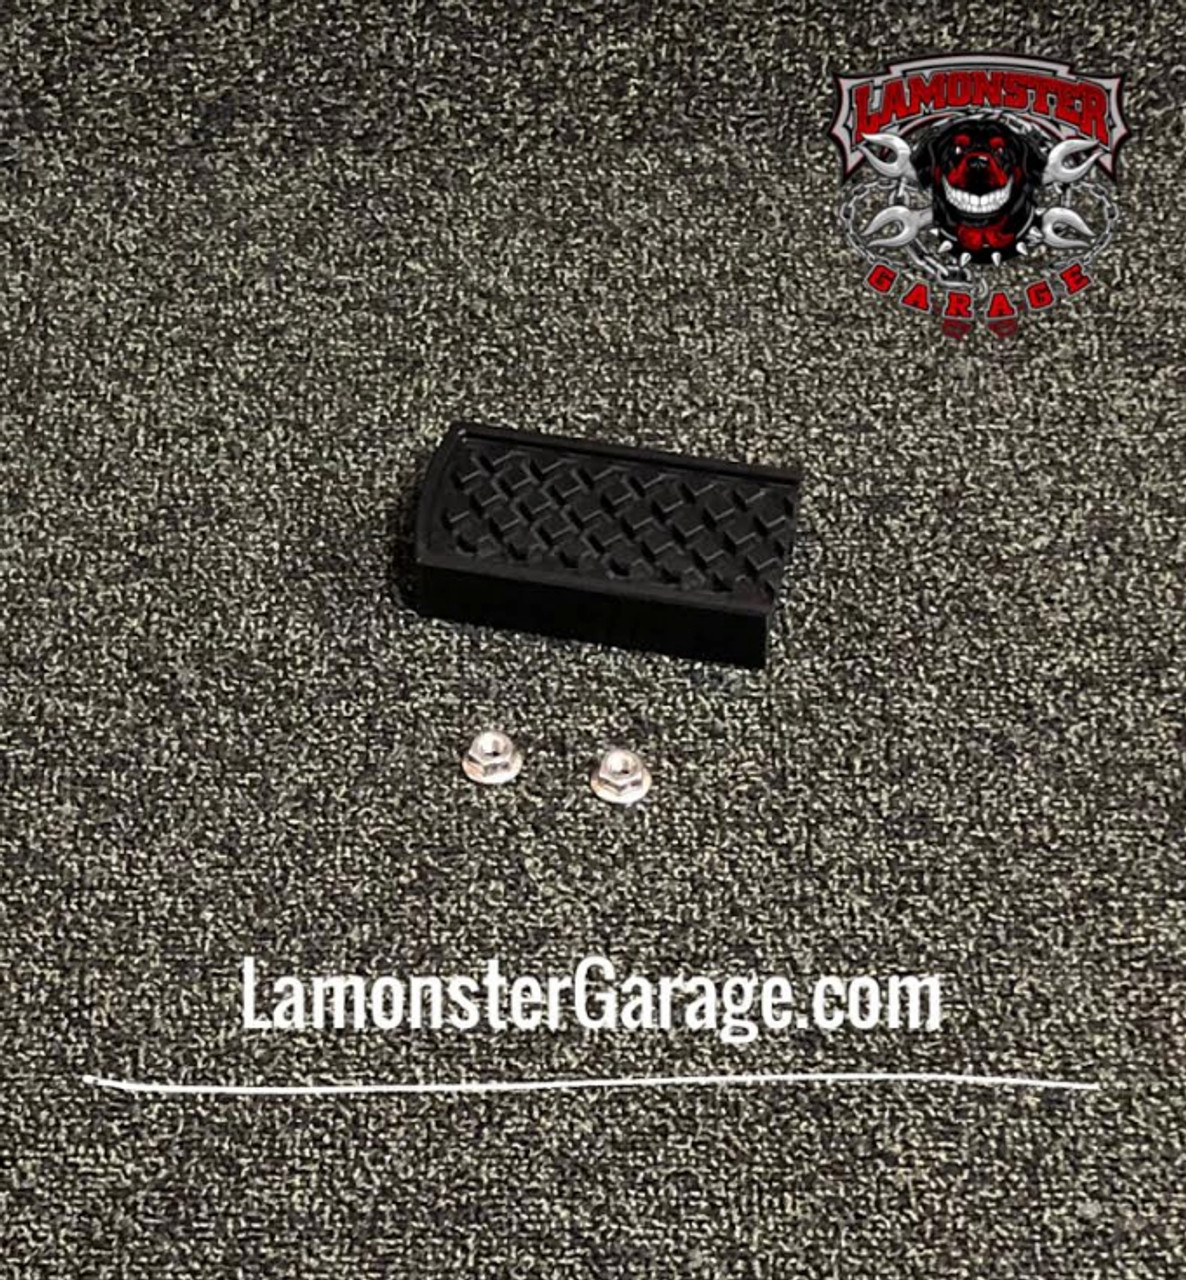 Lamonster Black Dymond Brake Pedal (LG-1009B) (BLACK) Fits all Can-Am Spyder F3, RT, ST Models